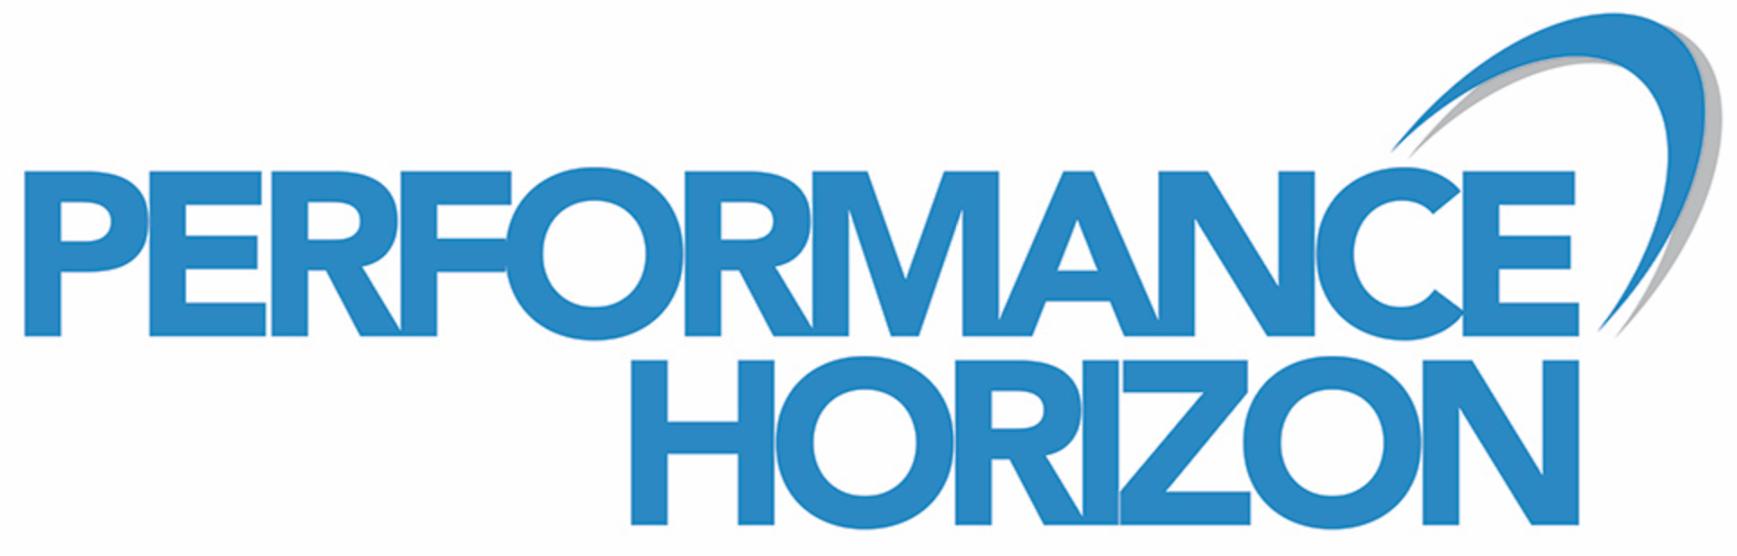 performance horizon png.png